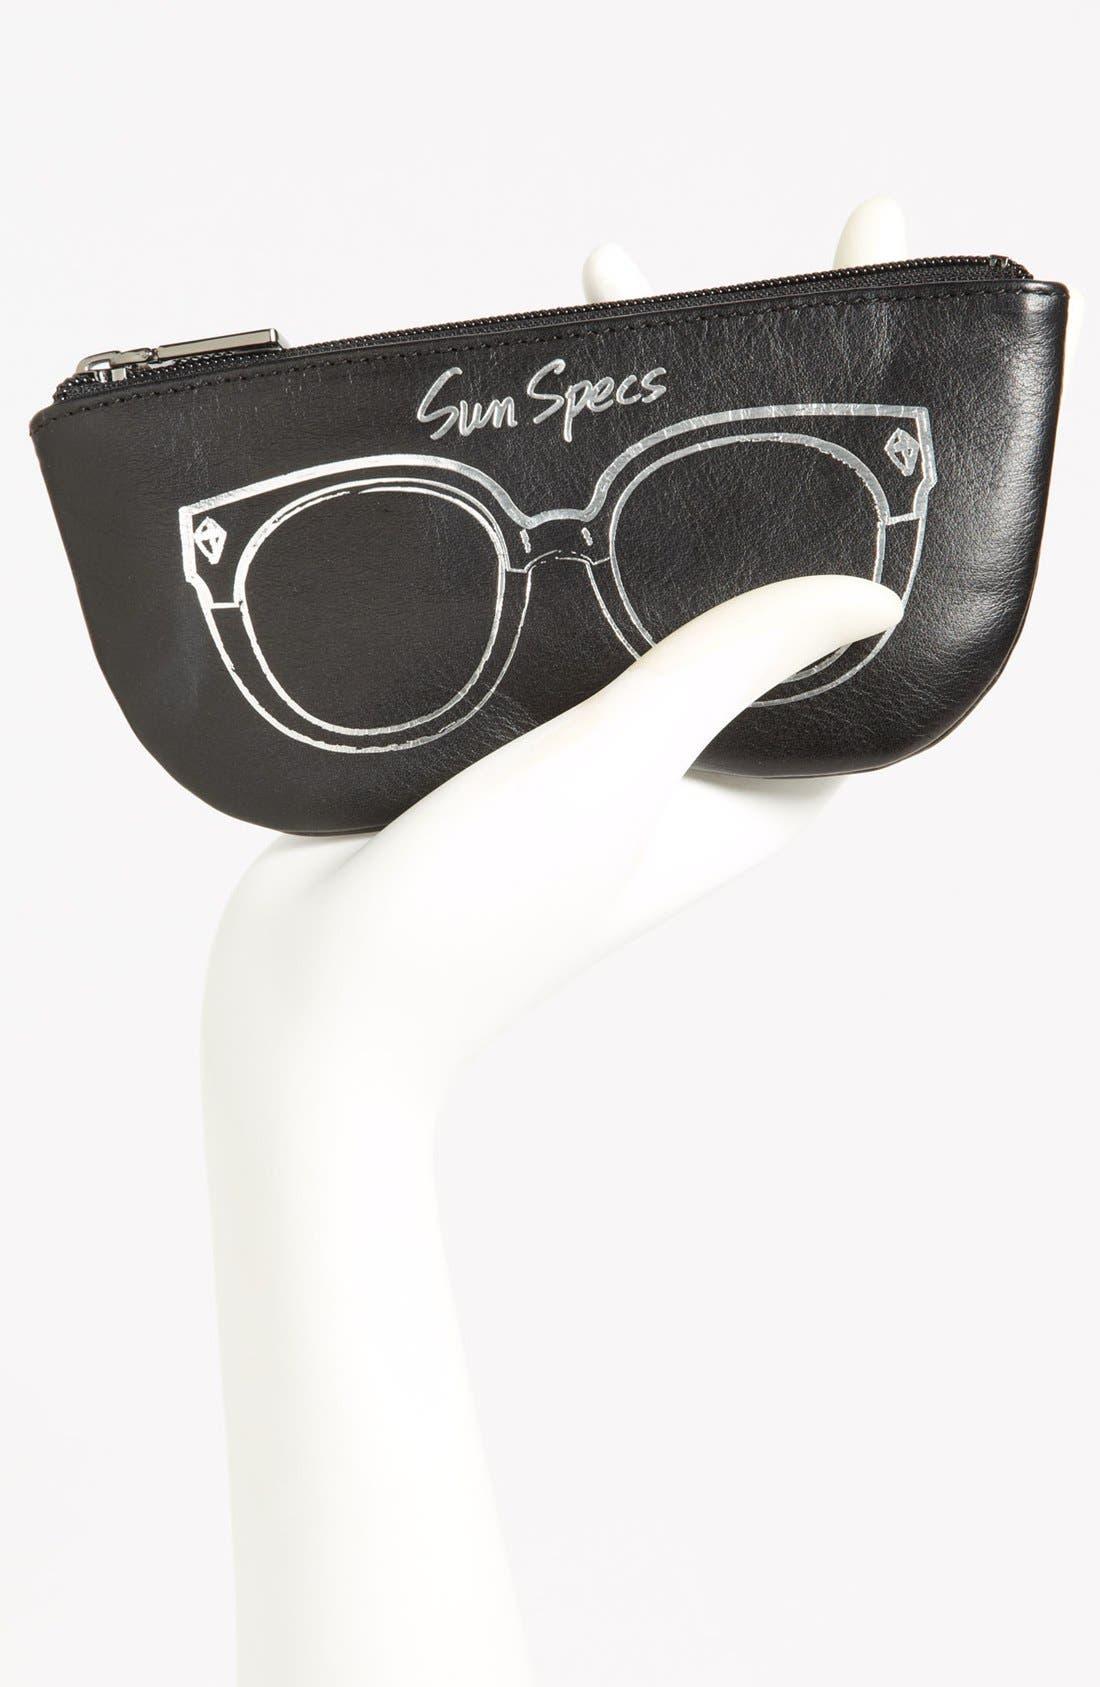 Alternate Image 2  - Rebecca Minkoff 'Sun Specs' Leather Sunglasses Case